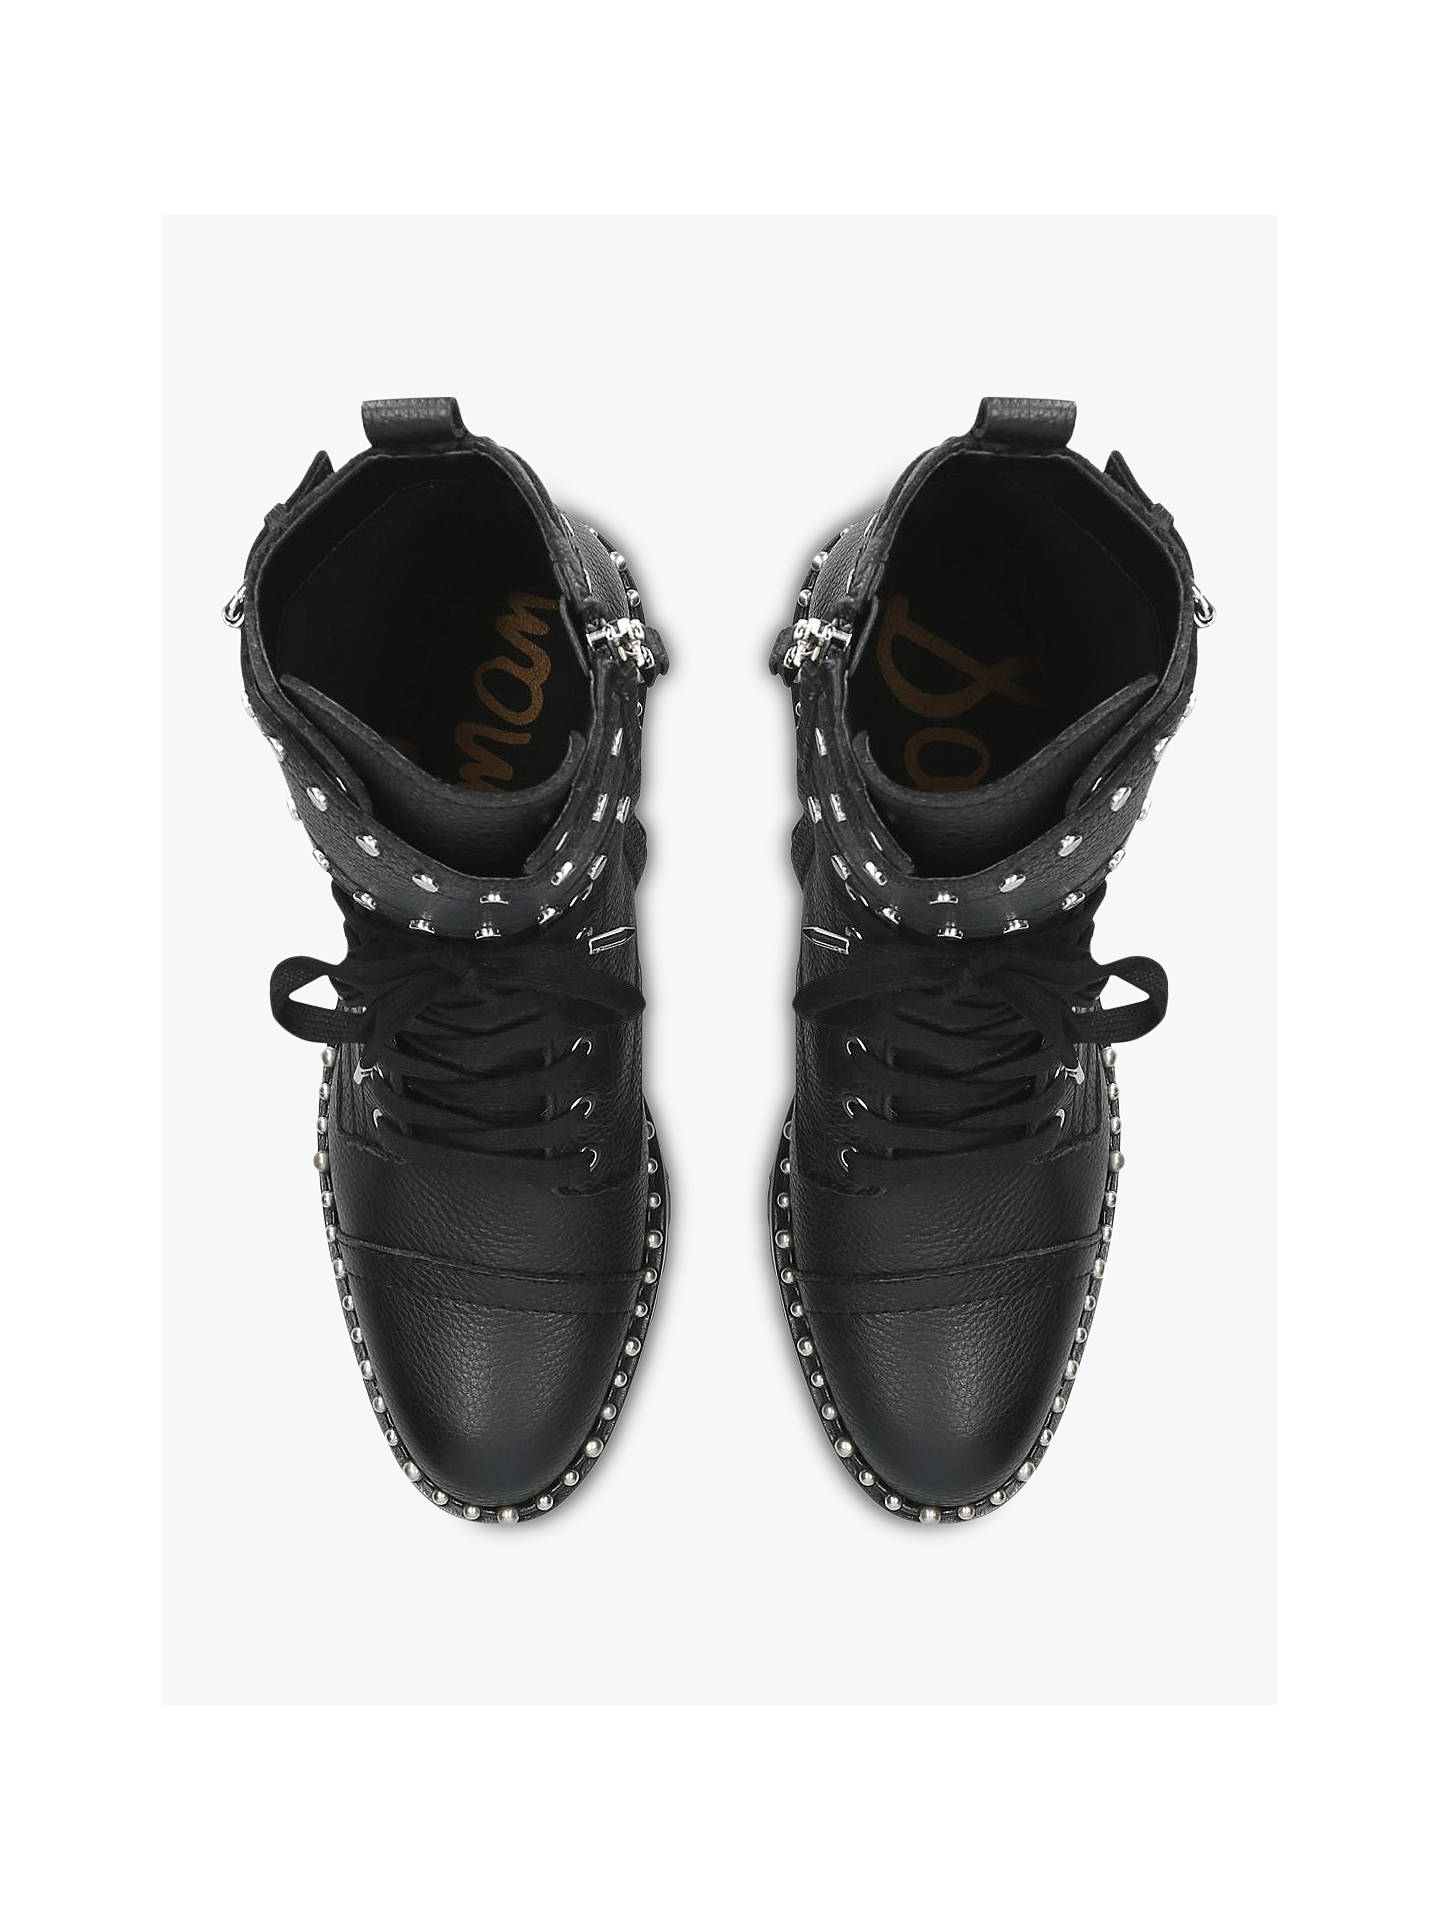 d023be01abab3 ... Buy Sam Edelman Jennifer Stud Lace Up Boots